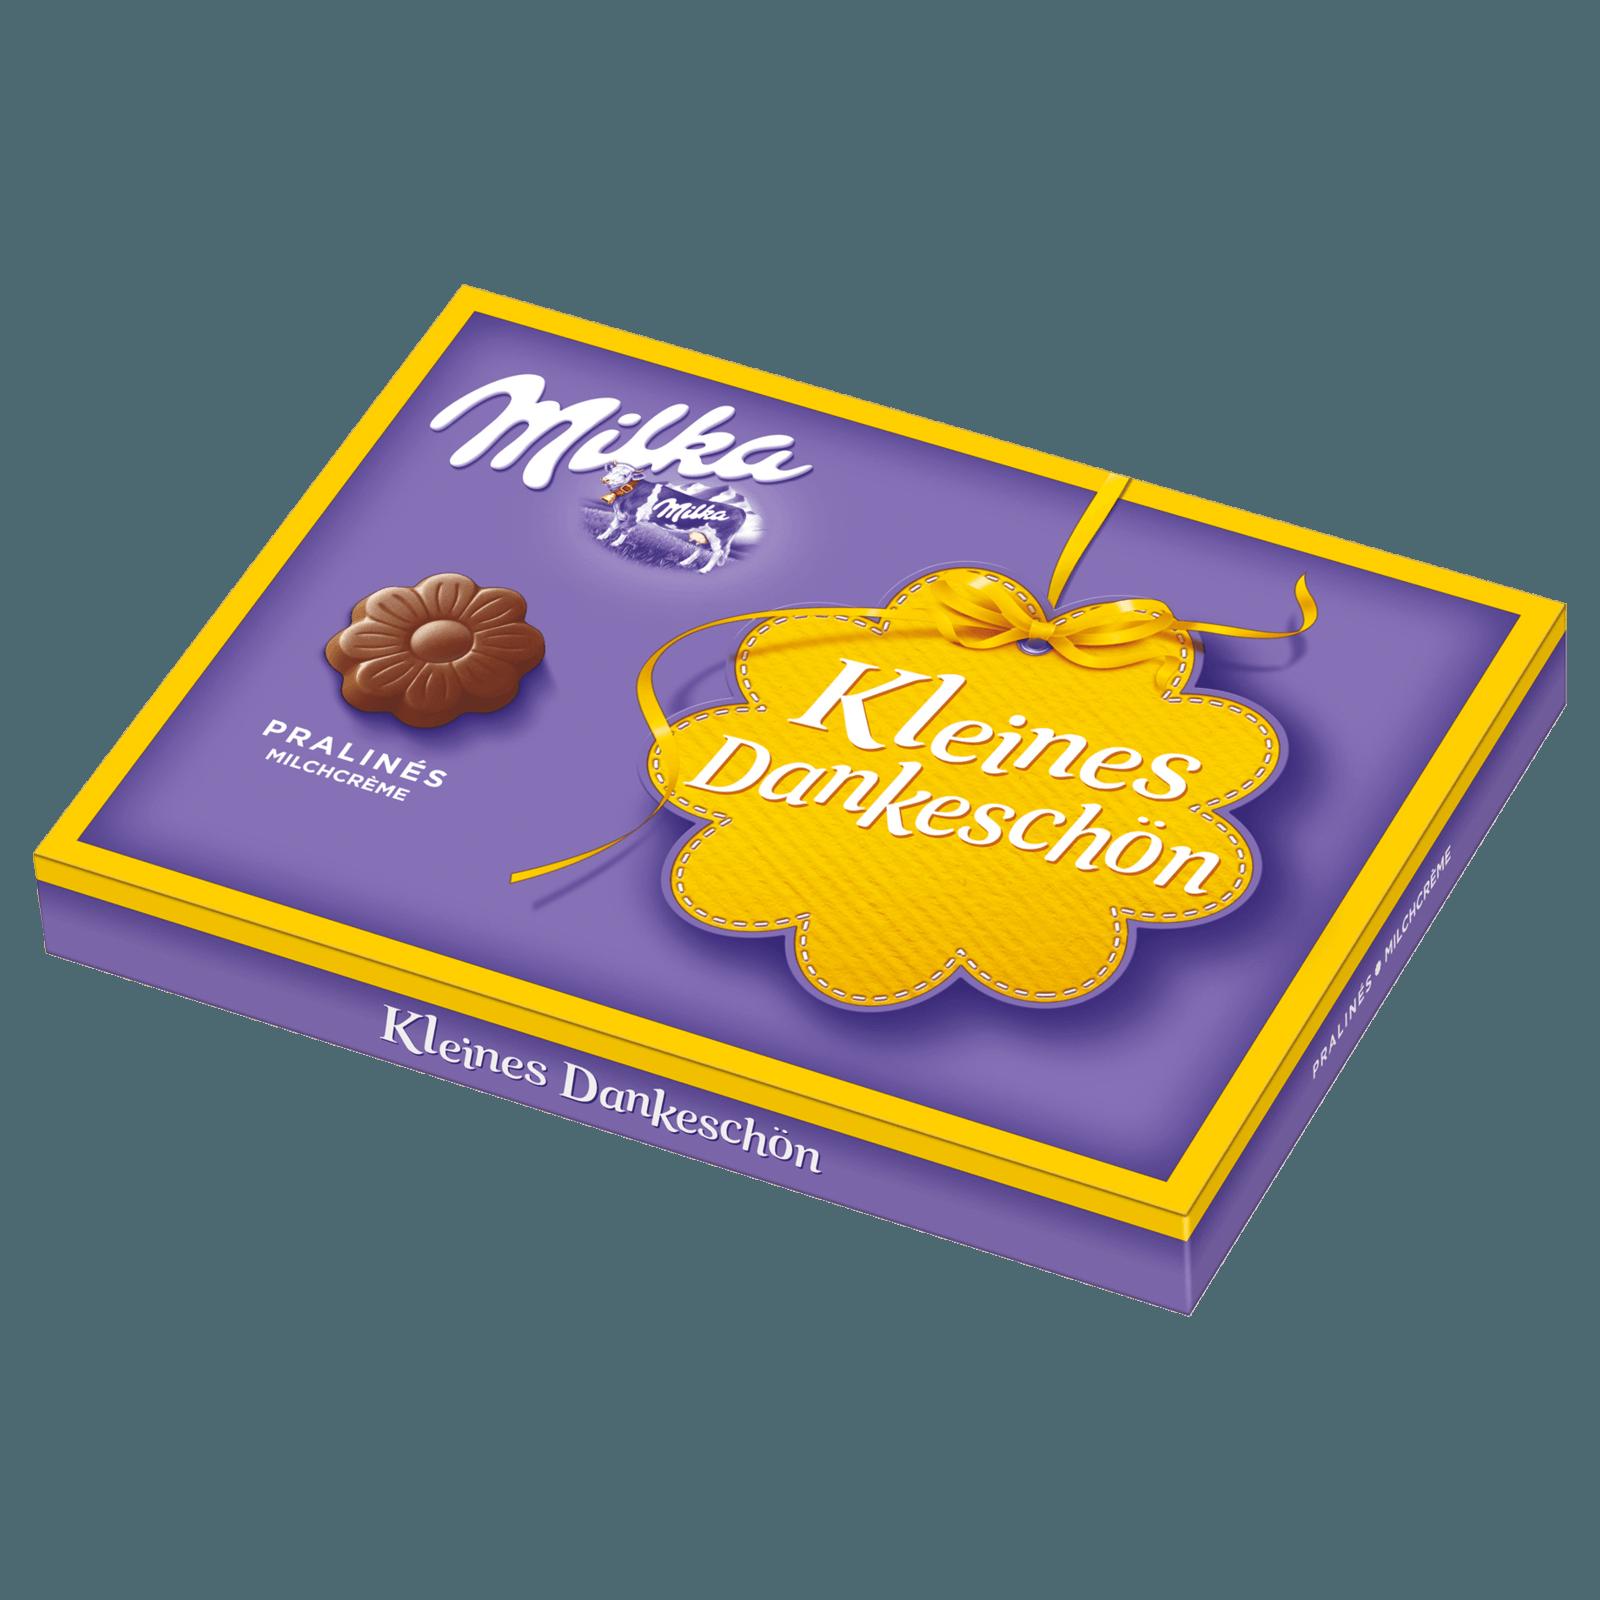 Milka Pralinés Kleines Dankeschön 110g